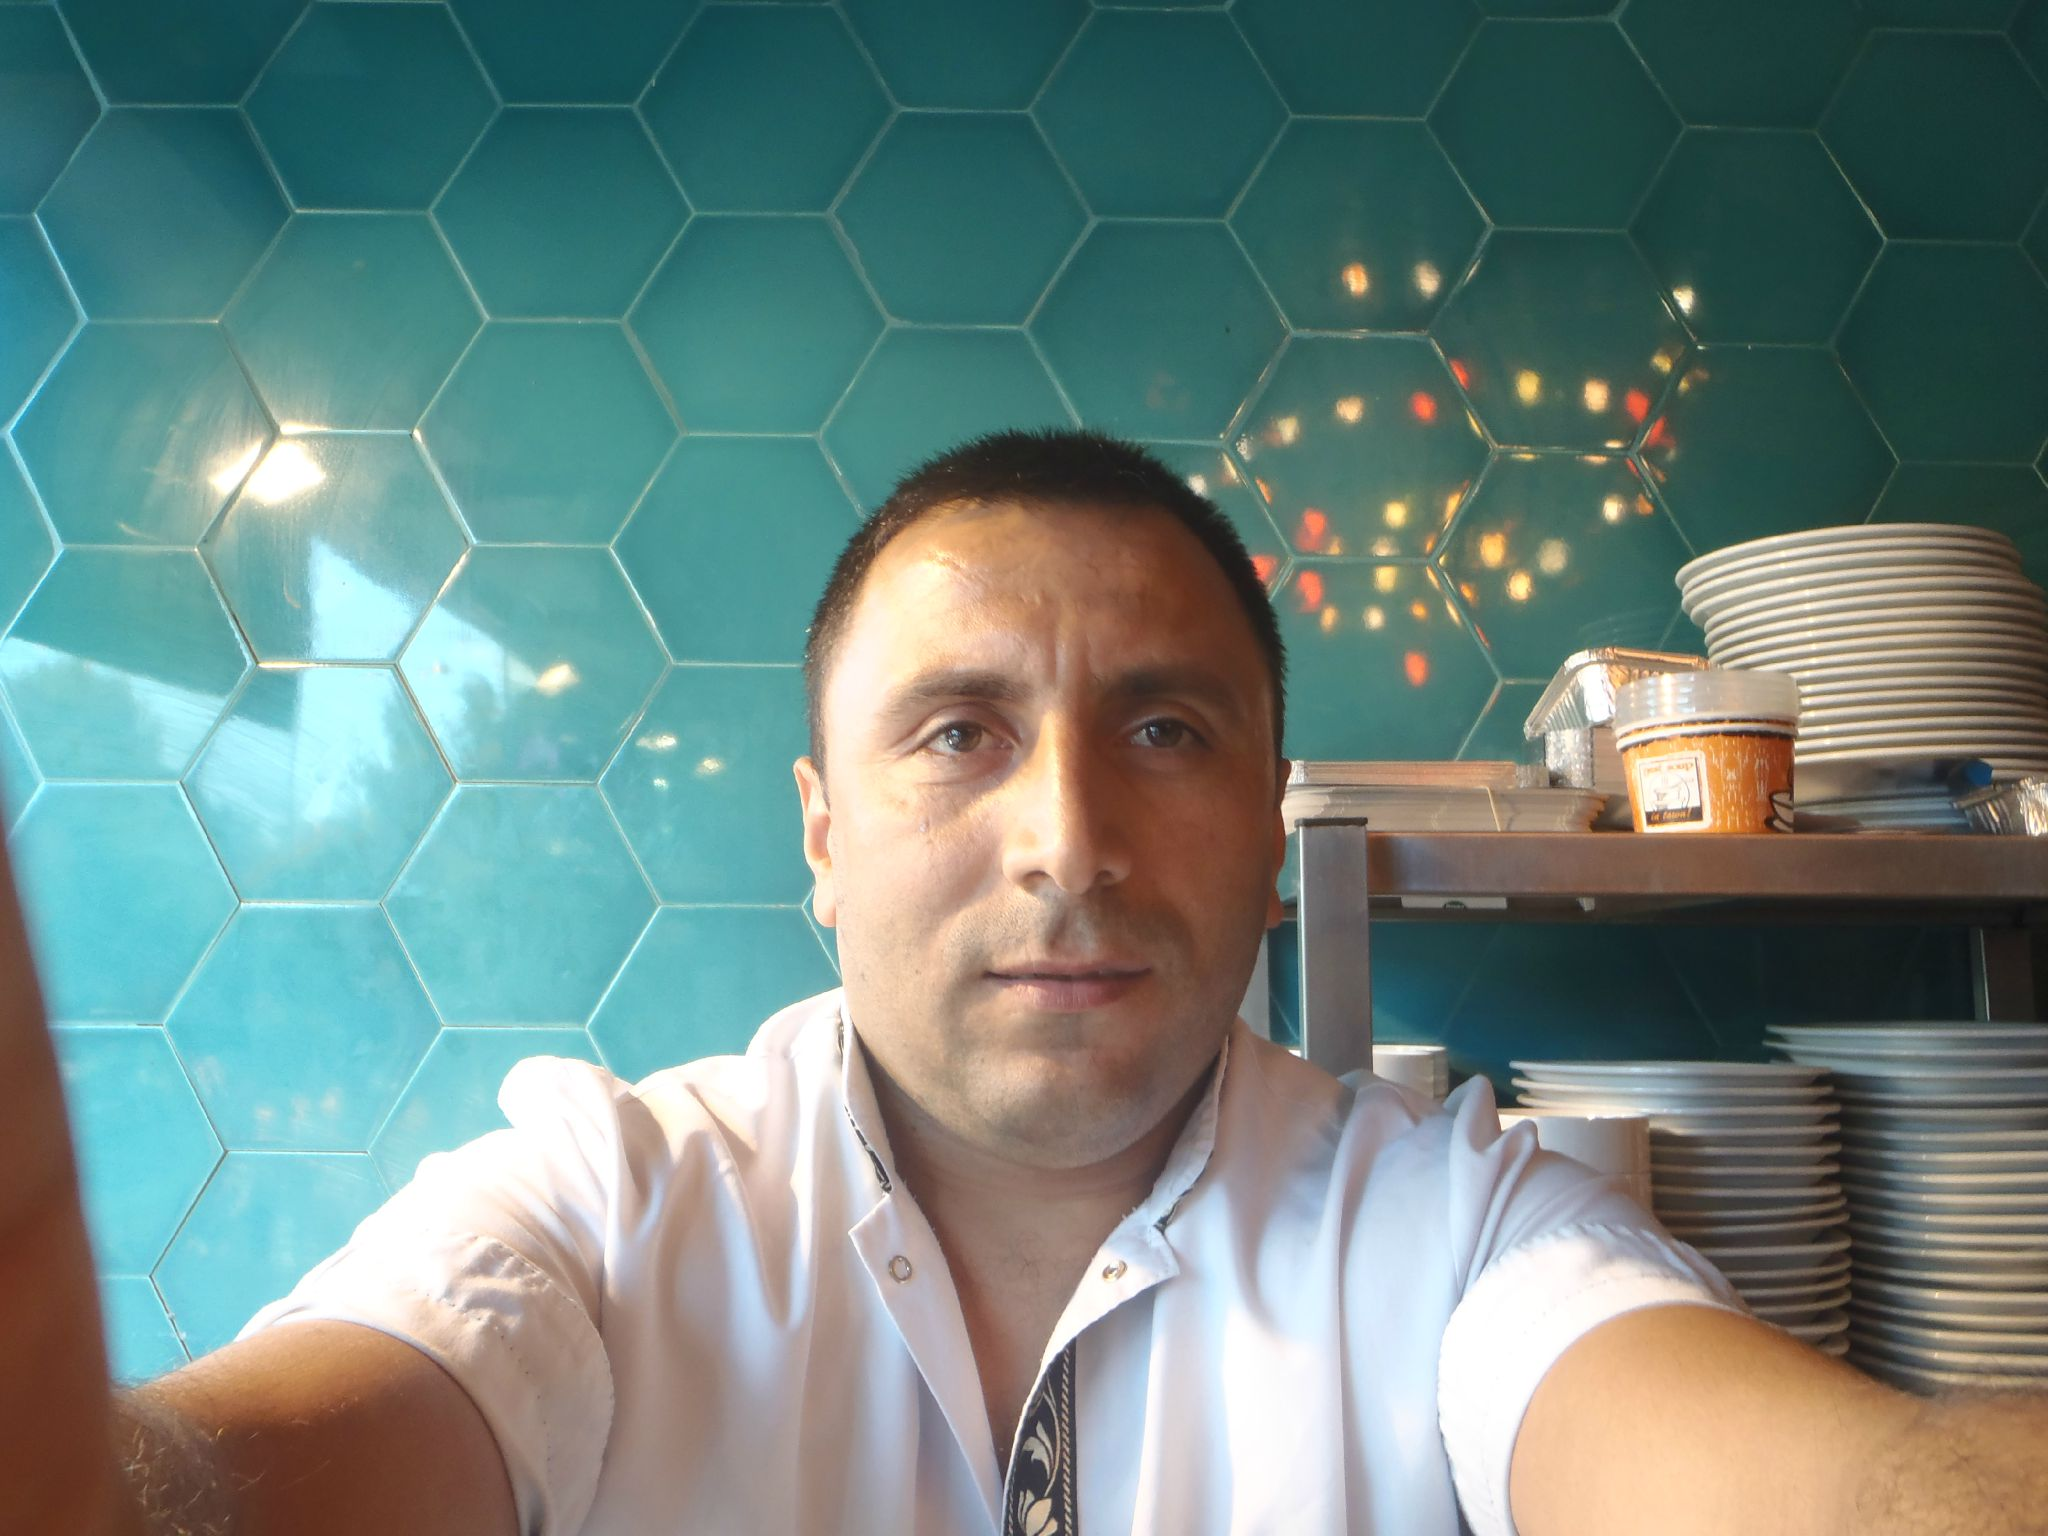 turquie istanbul le photographe auto portrait